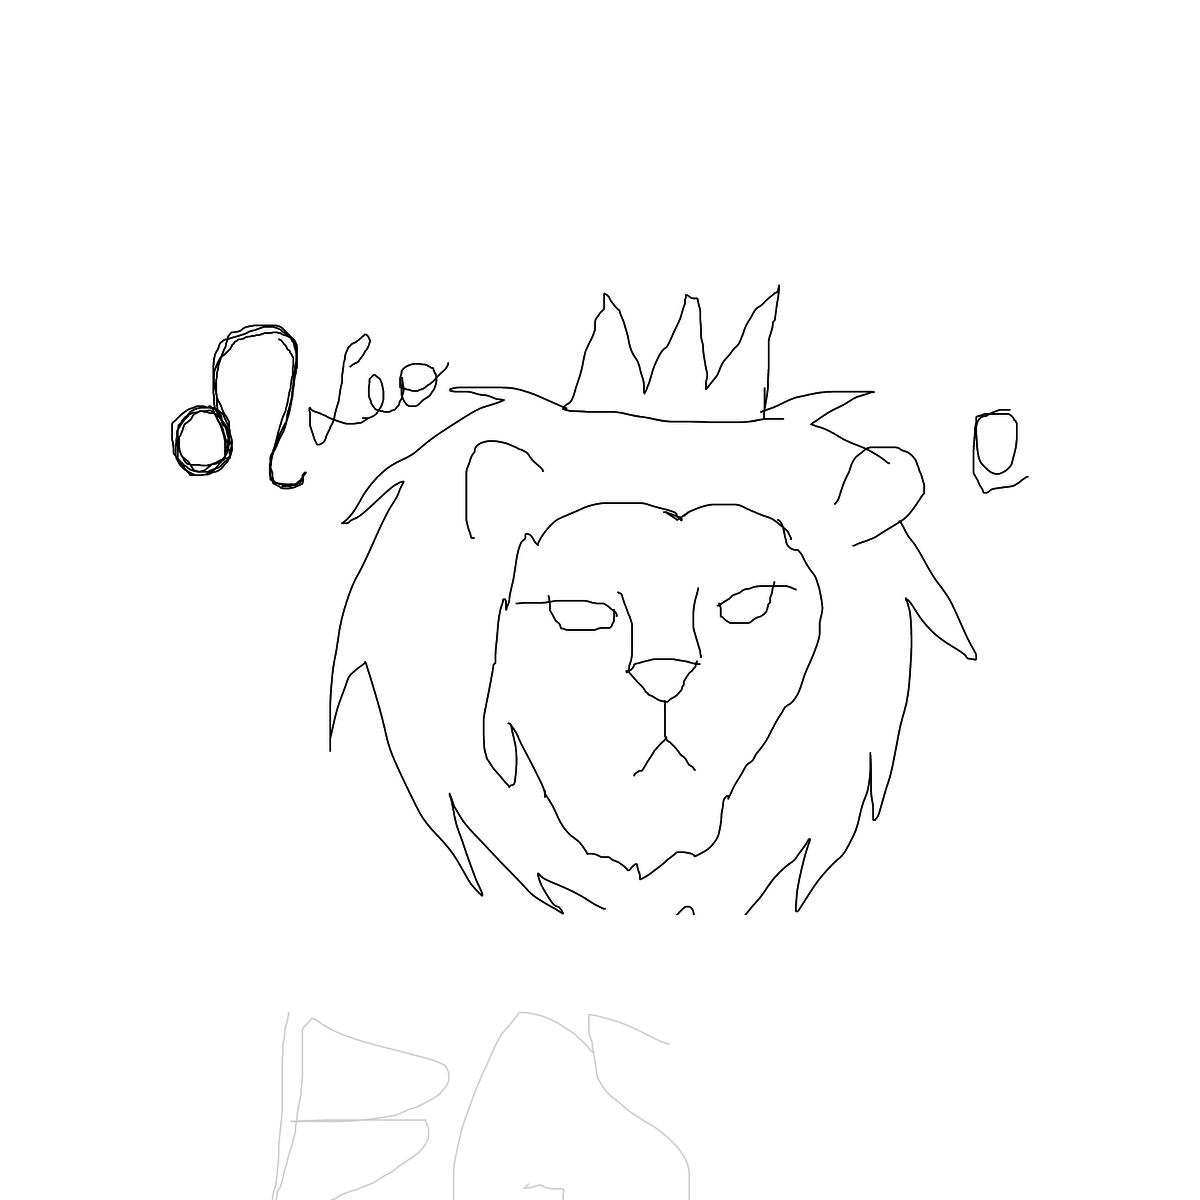 BAAAM drawing#24635 lat:46.2978744506835940lng: 18.5294284820556640